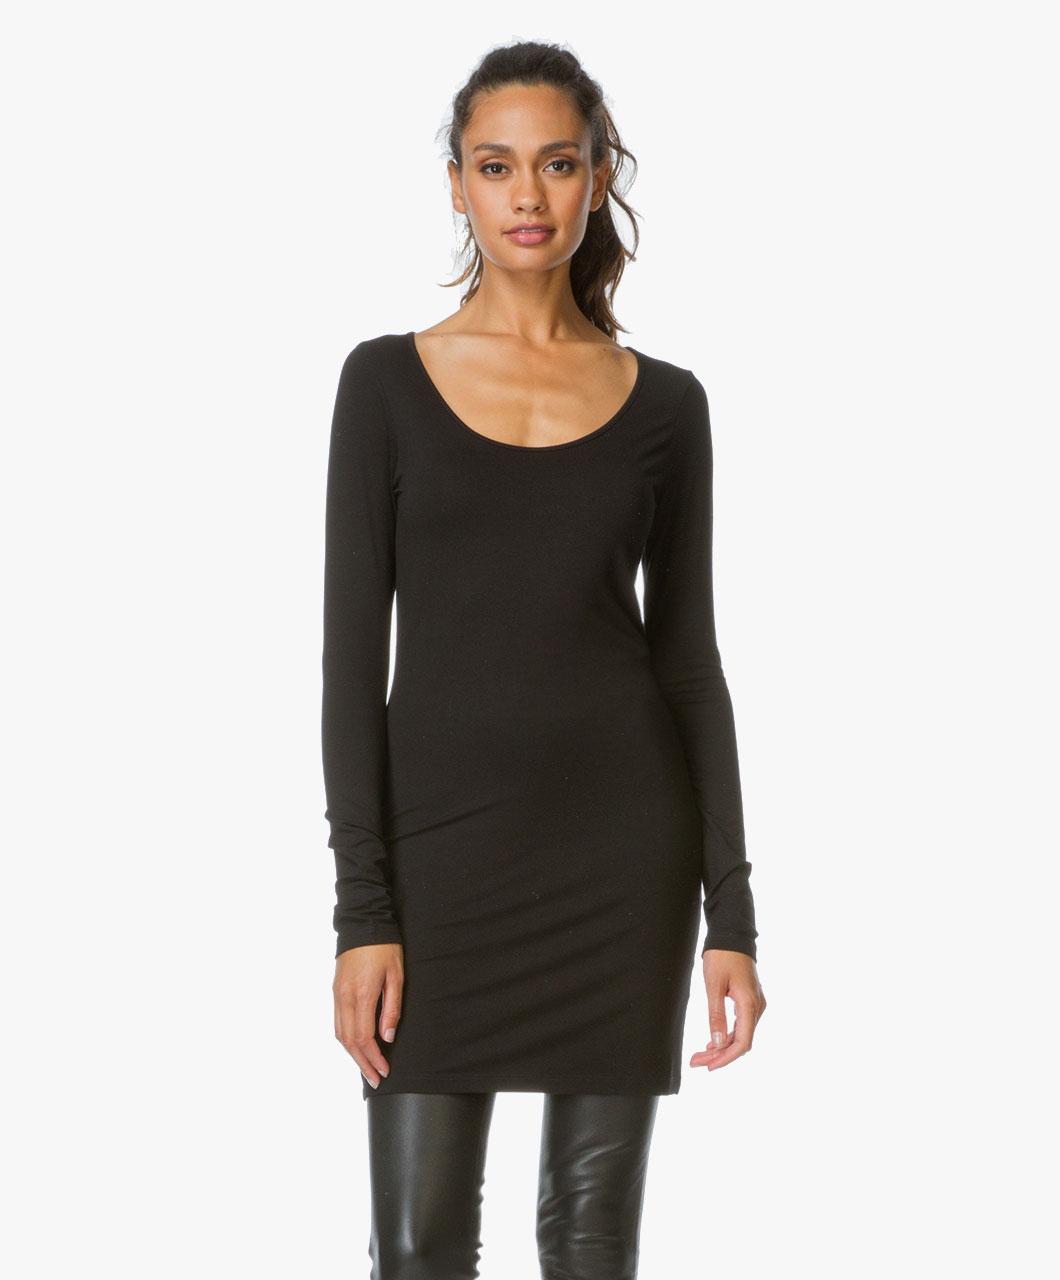 Shop The Look Versatile Layered Look Pagina 7